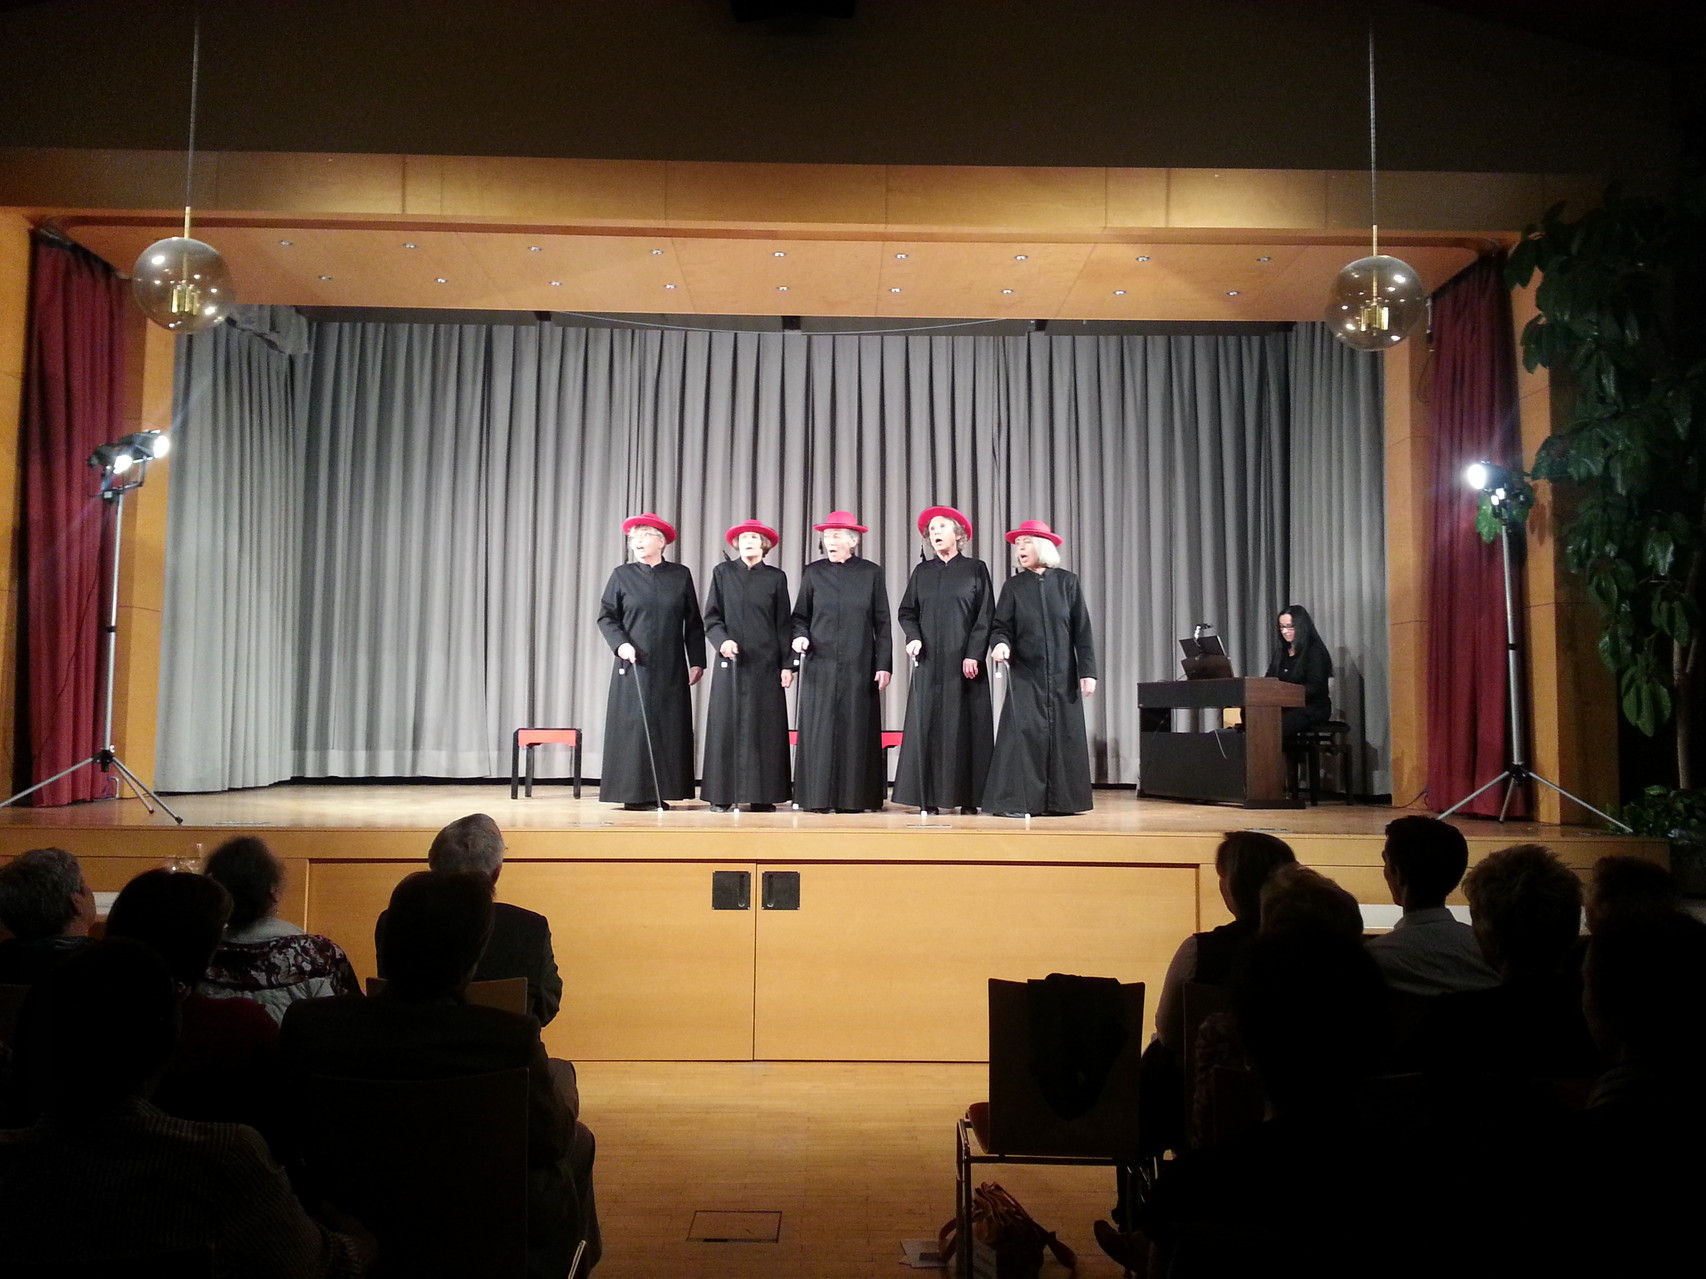 Parrsaal - Kirchenfrauen-Kabarett (23.4.2013)